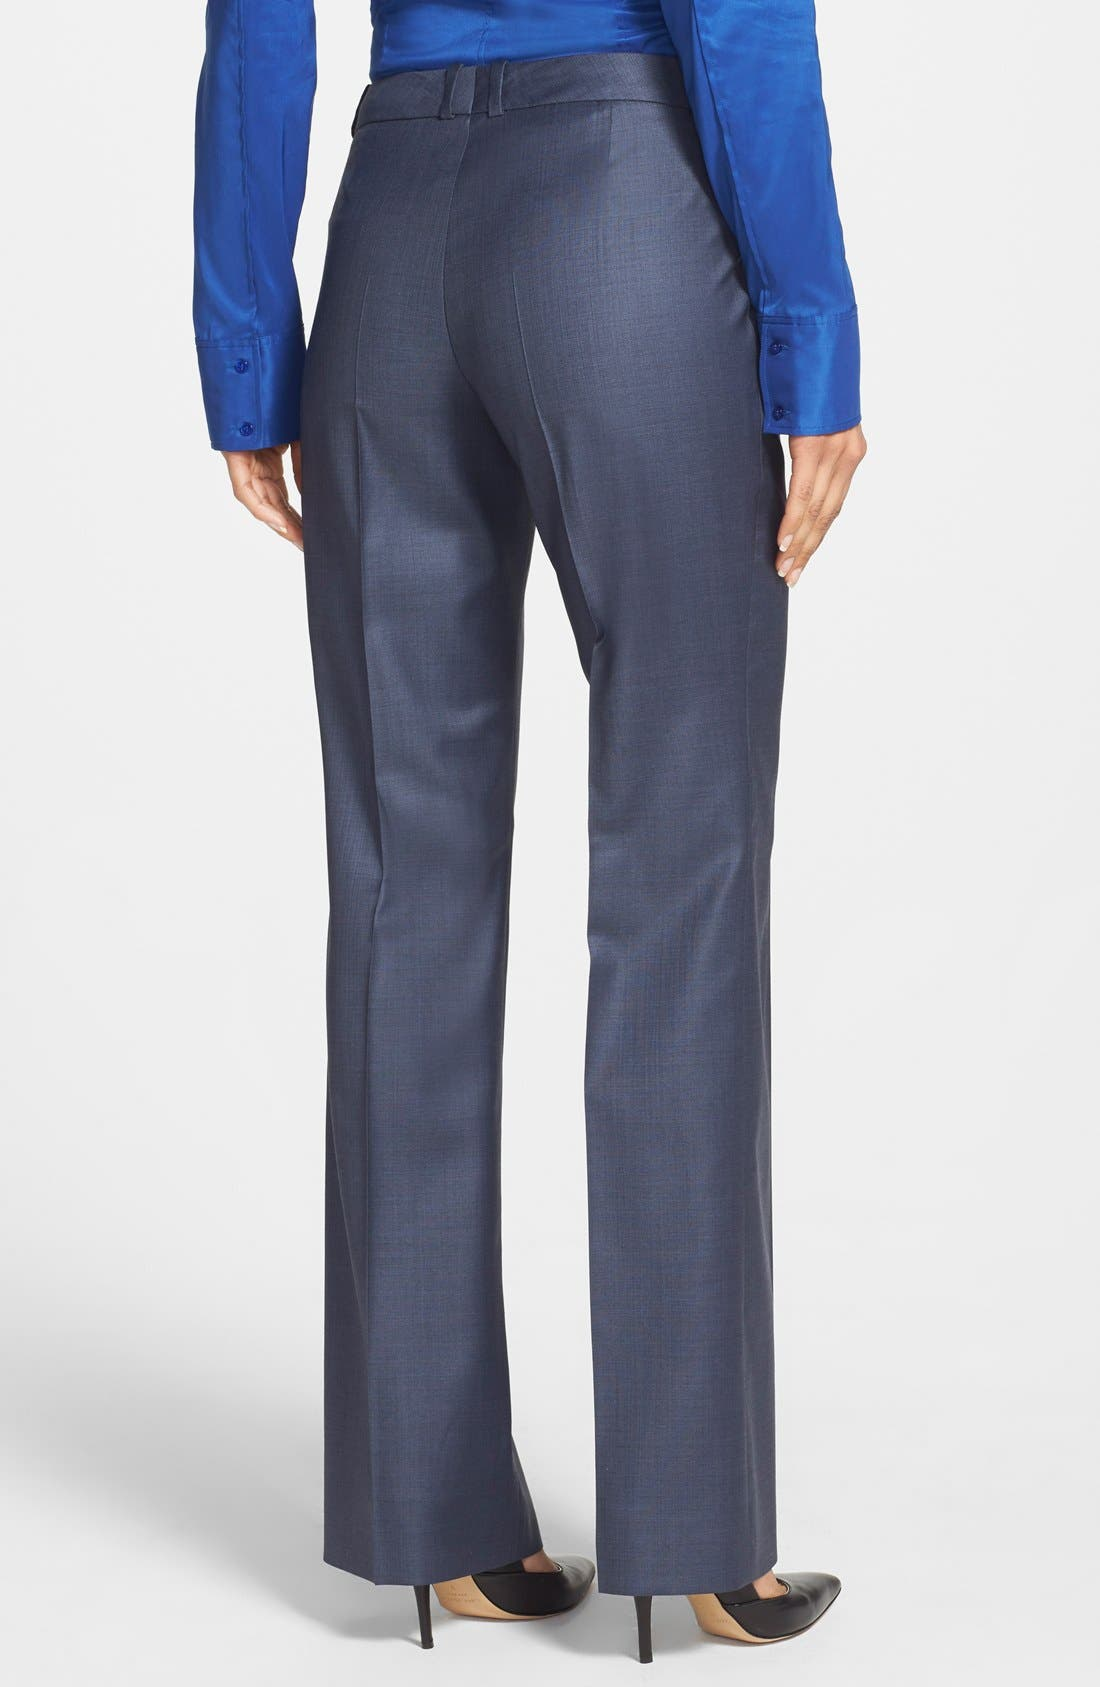 'Temuna' Wool Blend Suiting Trousers,                             Alternate thumbnail 5, color,                             463